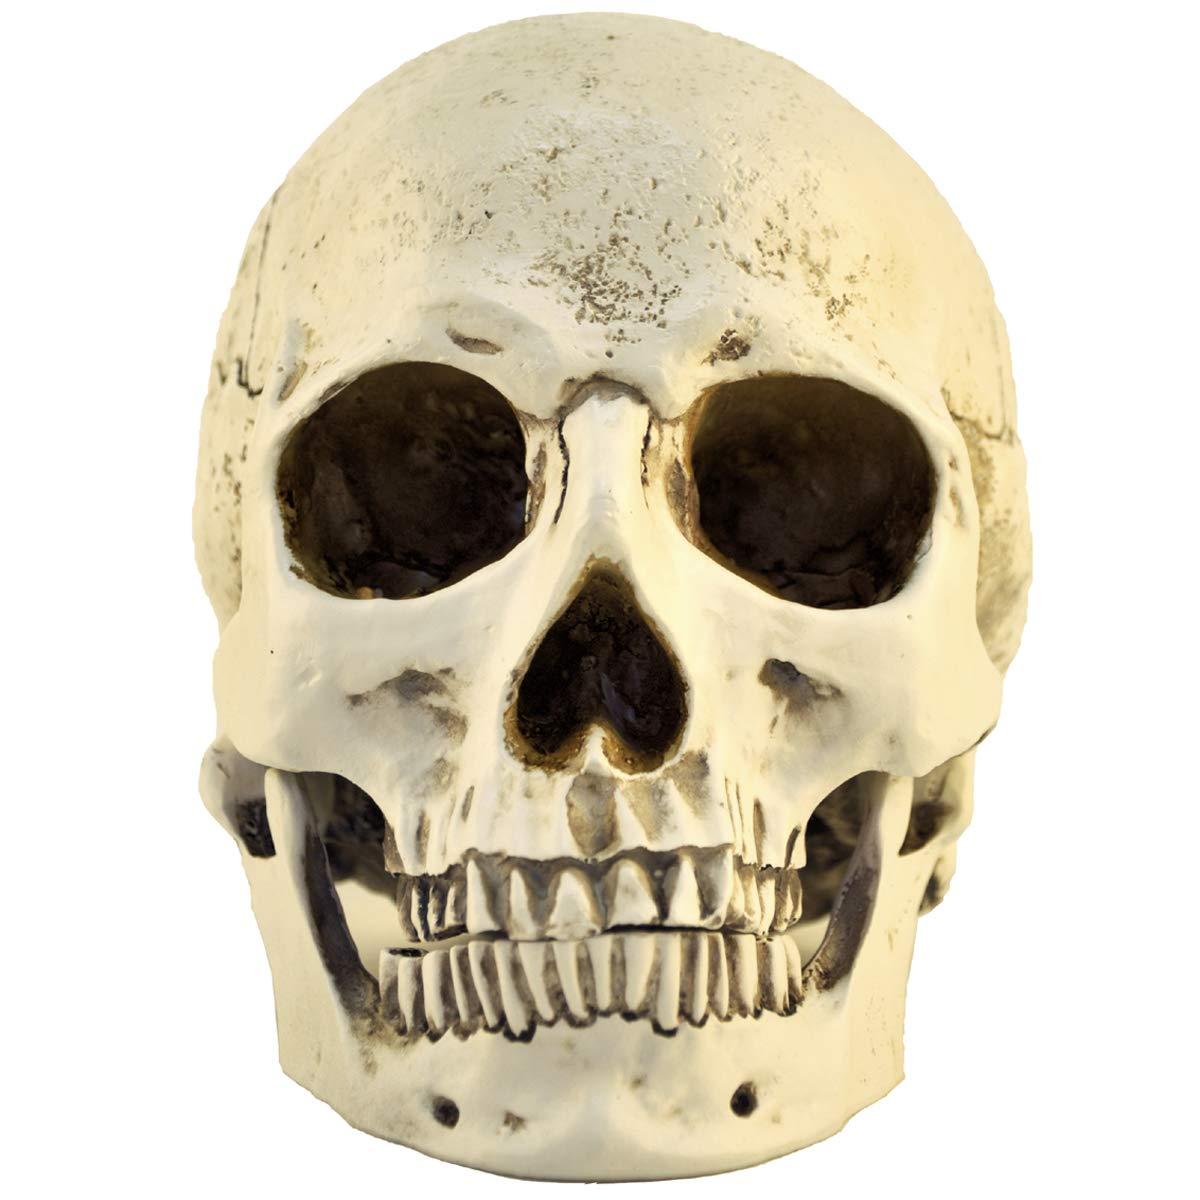 ENNAS 1 1 Resin Skull Head Model Simulation Skeleton Head Medical Skull Art Copy for Halloween Decor